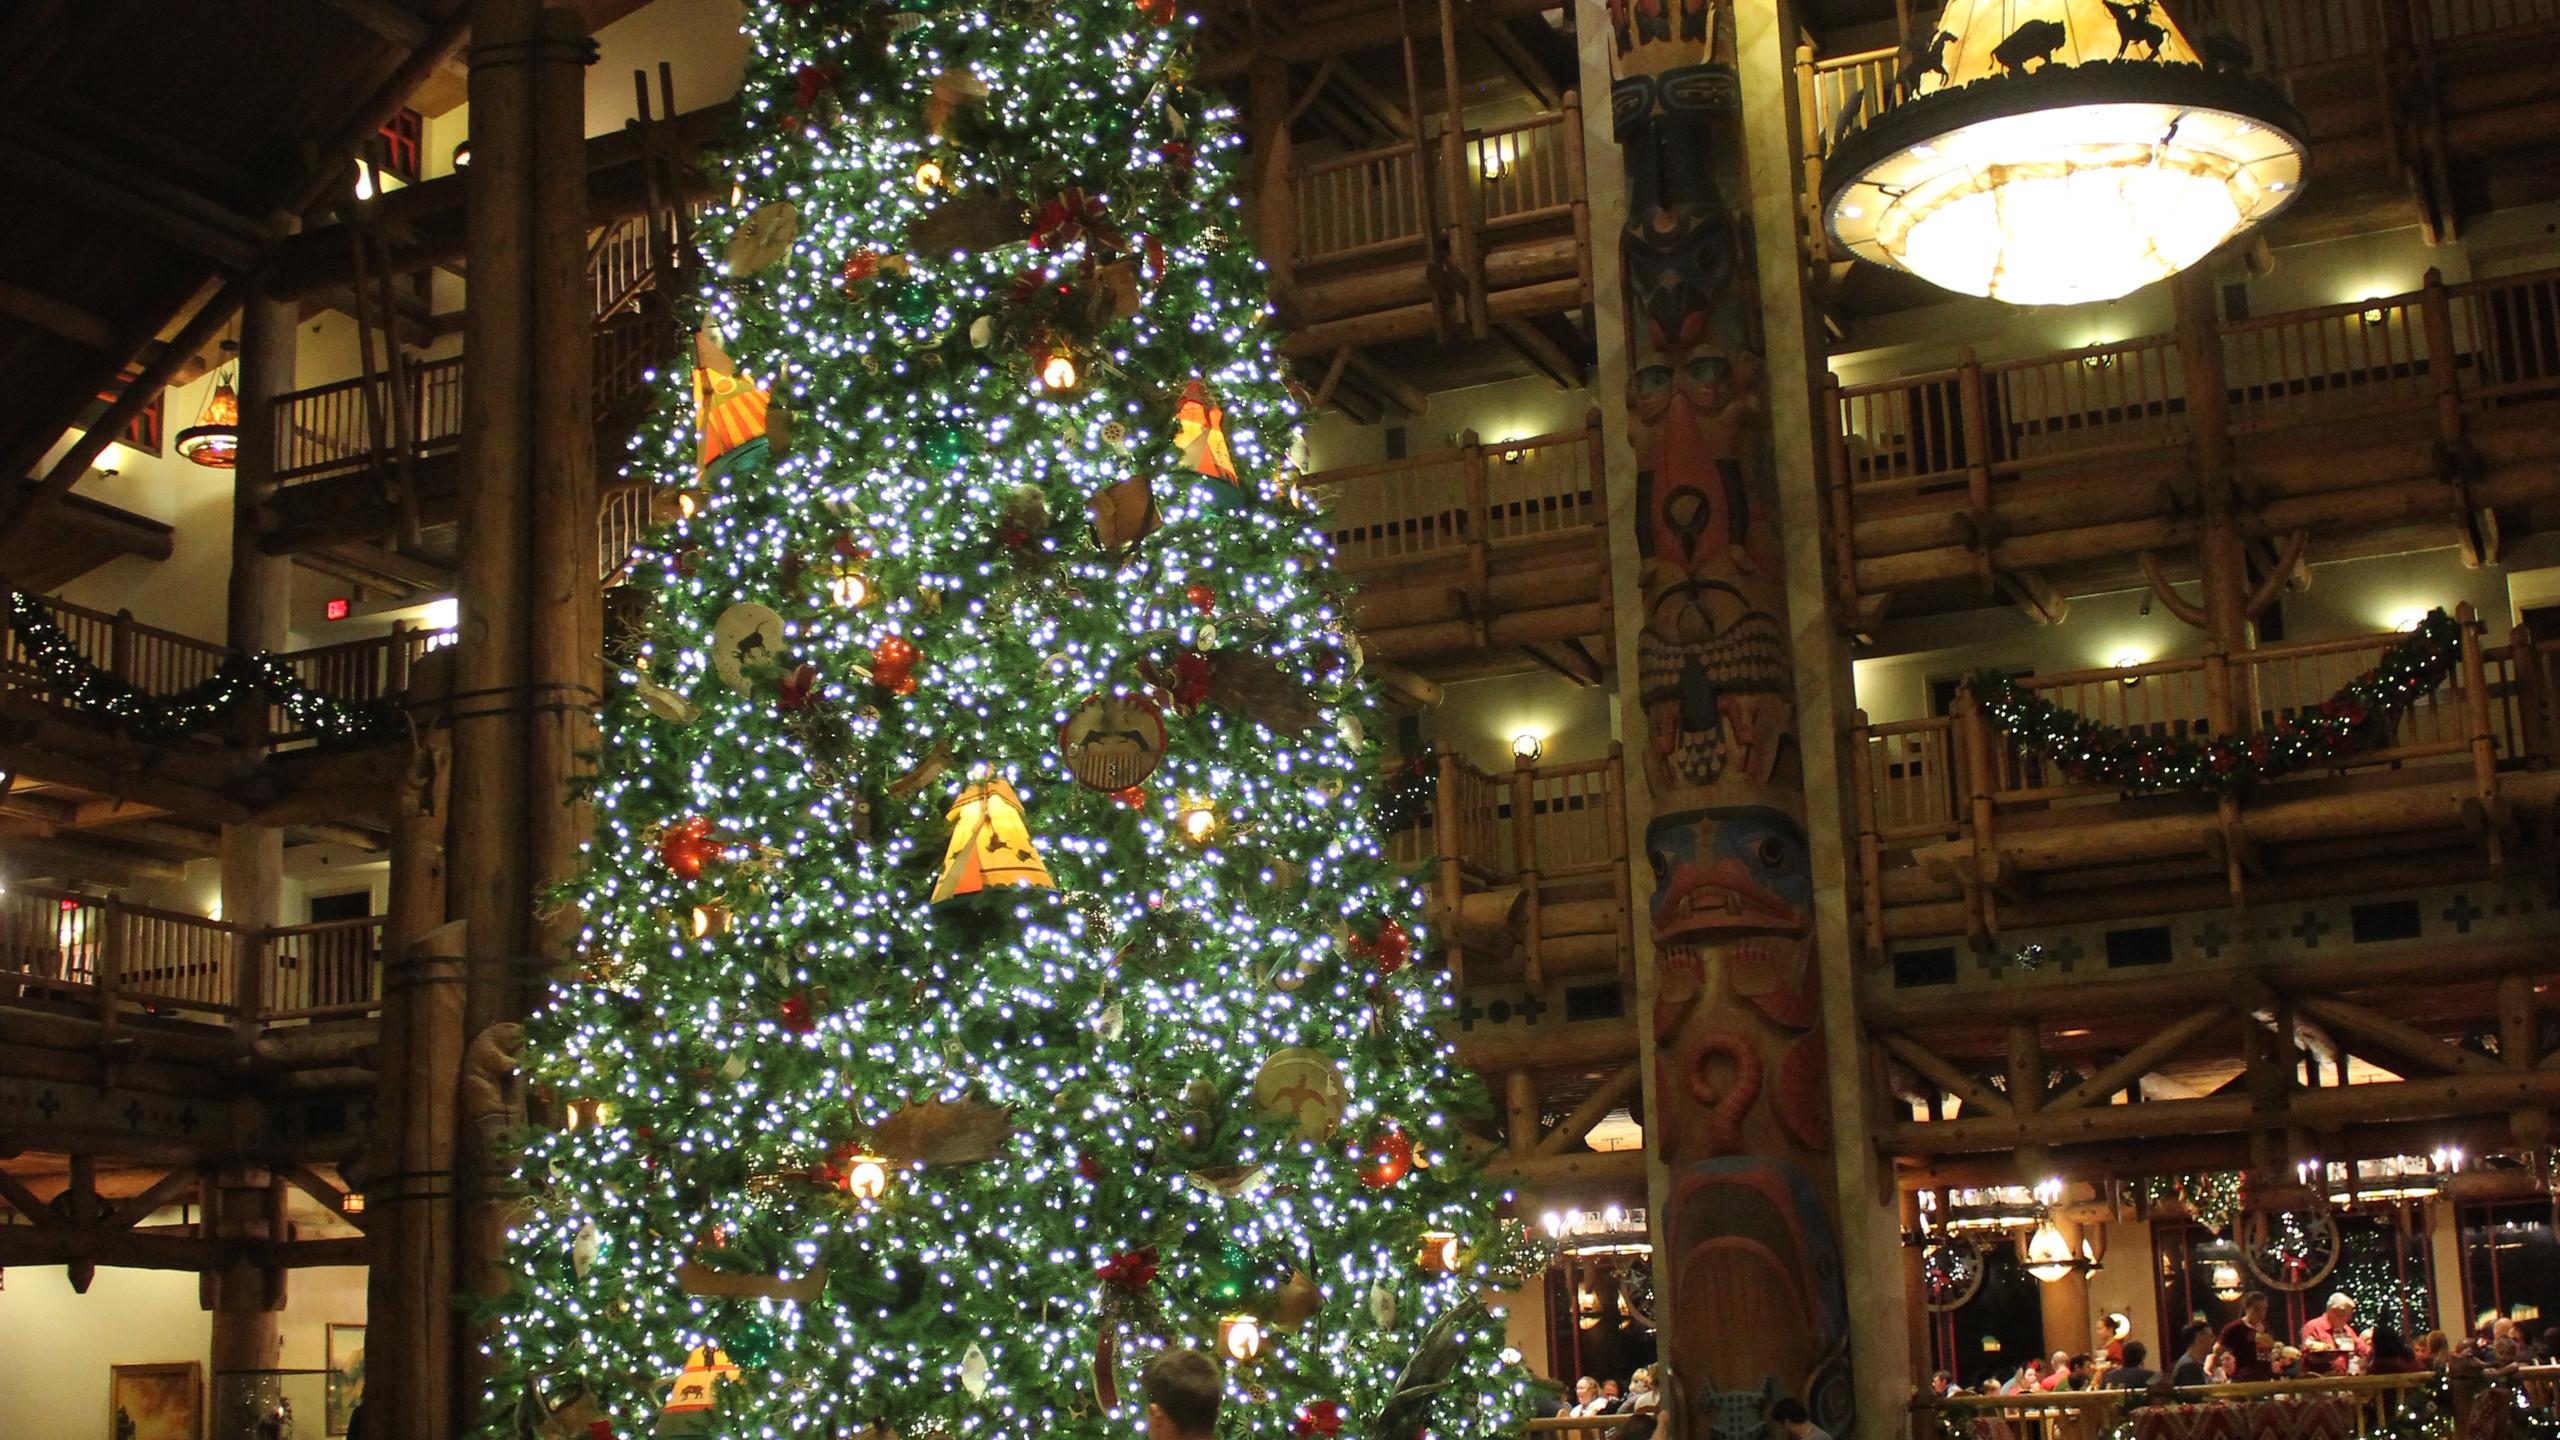 Christmas tree at Disney's Wilderness Lodge at Walt Disney World